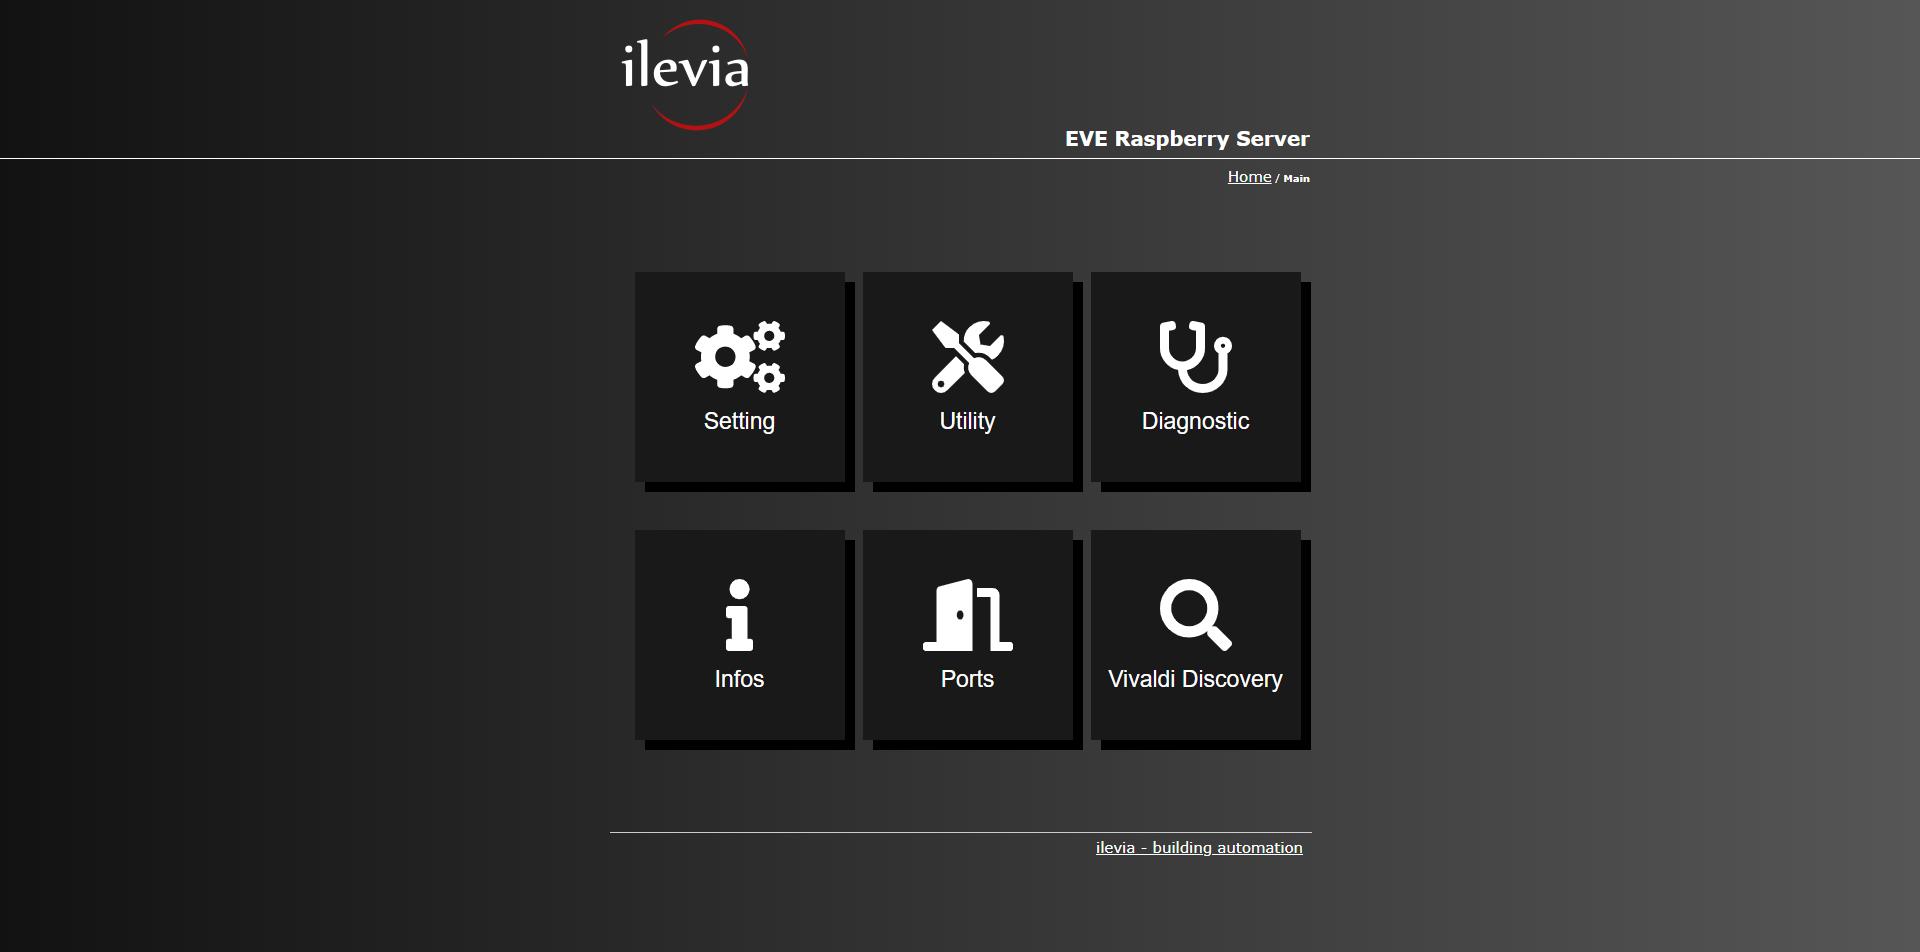 How the configuration menu looks like inside the Web interface of the Home automation Raspberry EVE server